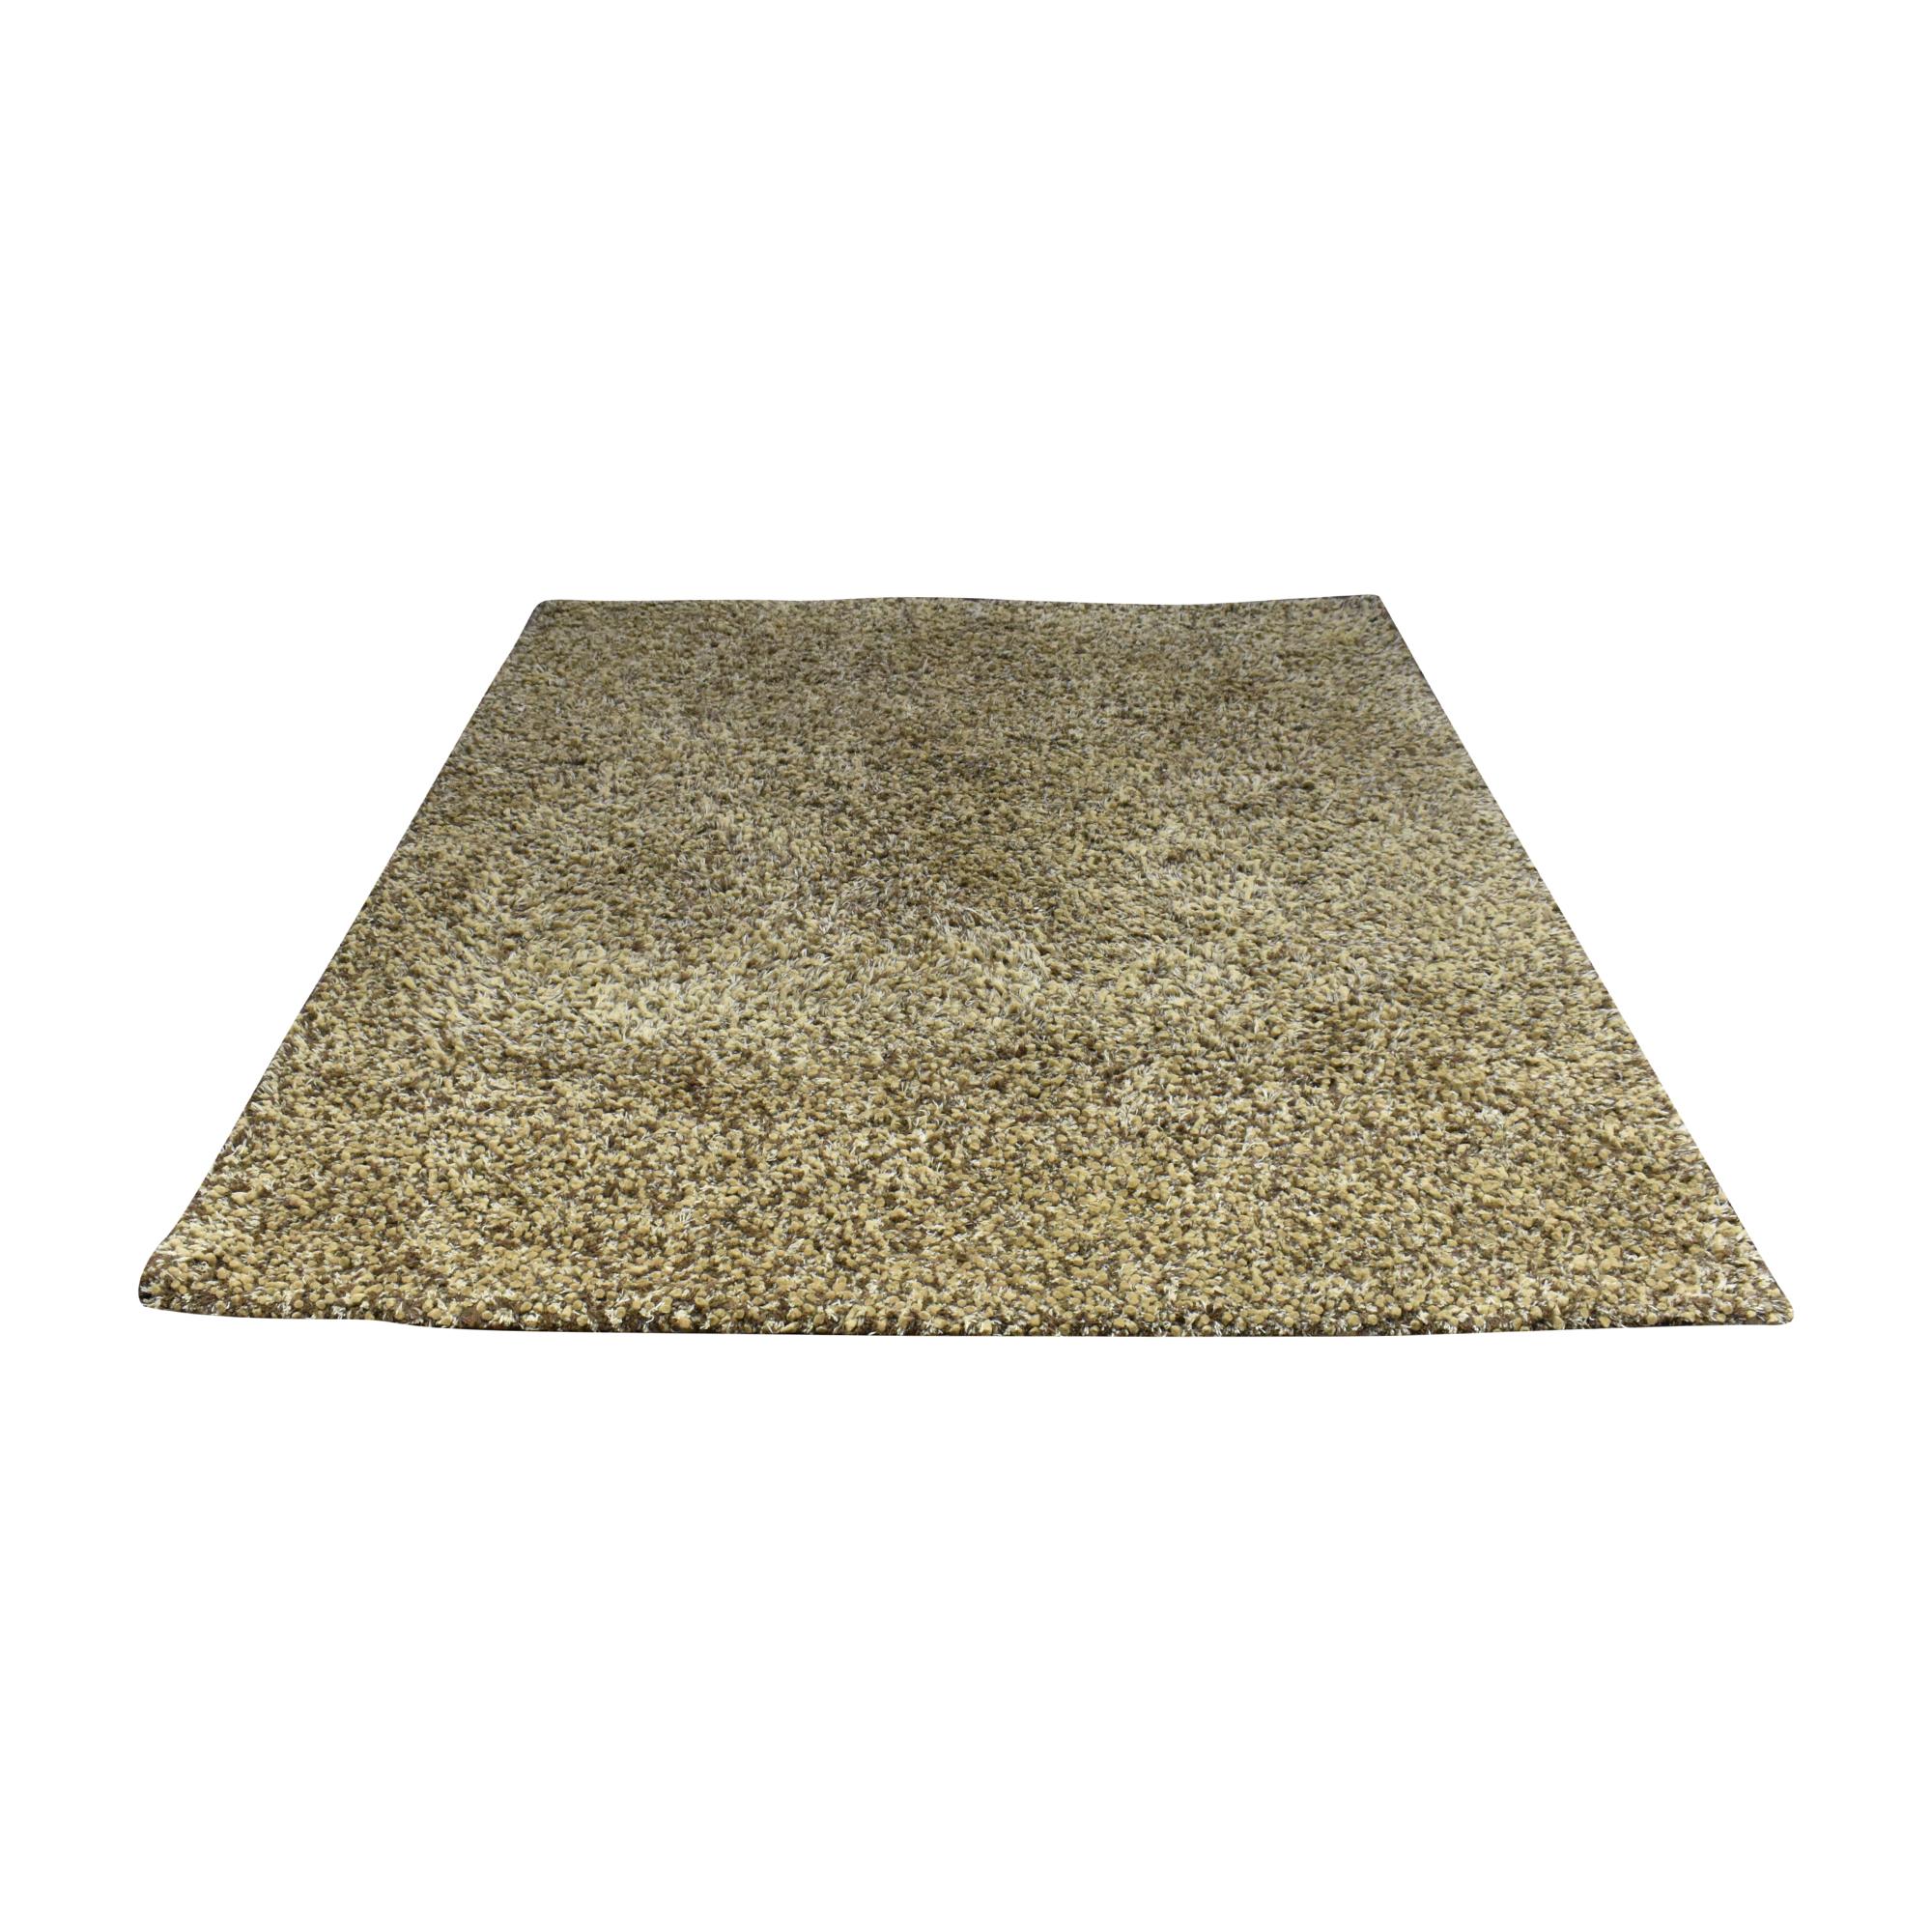 Couristan Lagash Area Rug / Decor